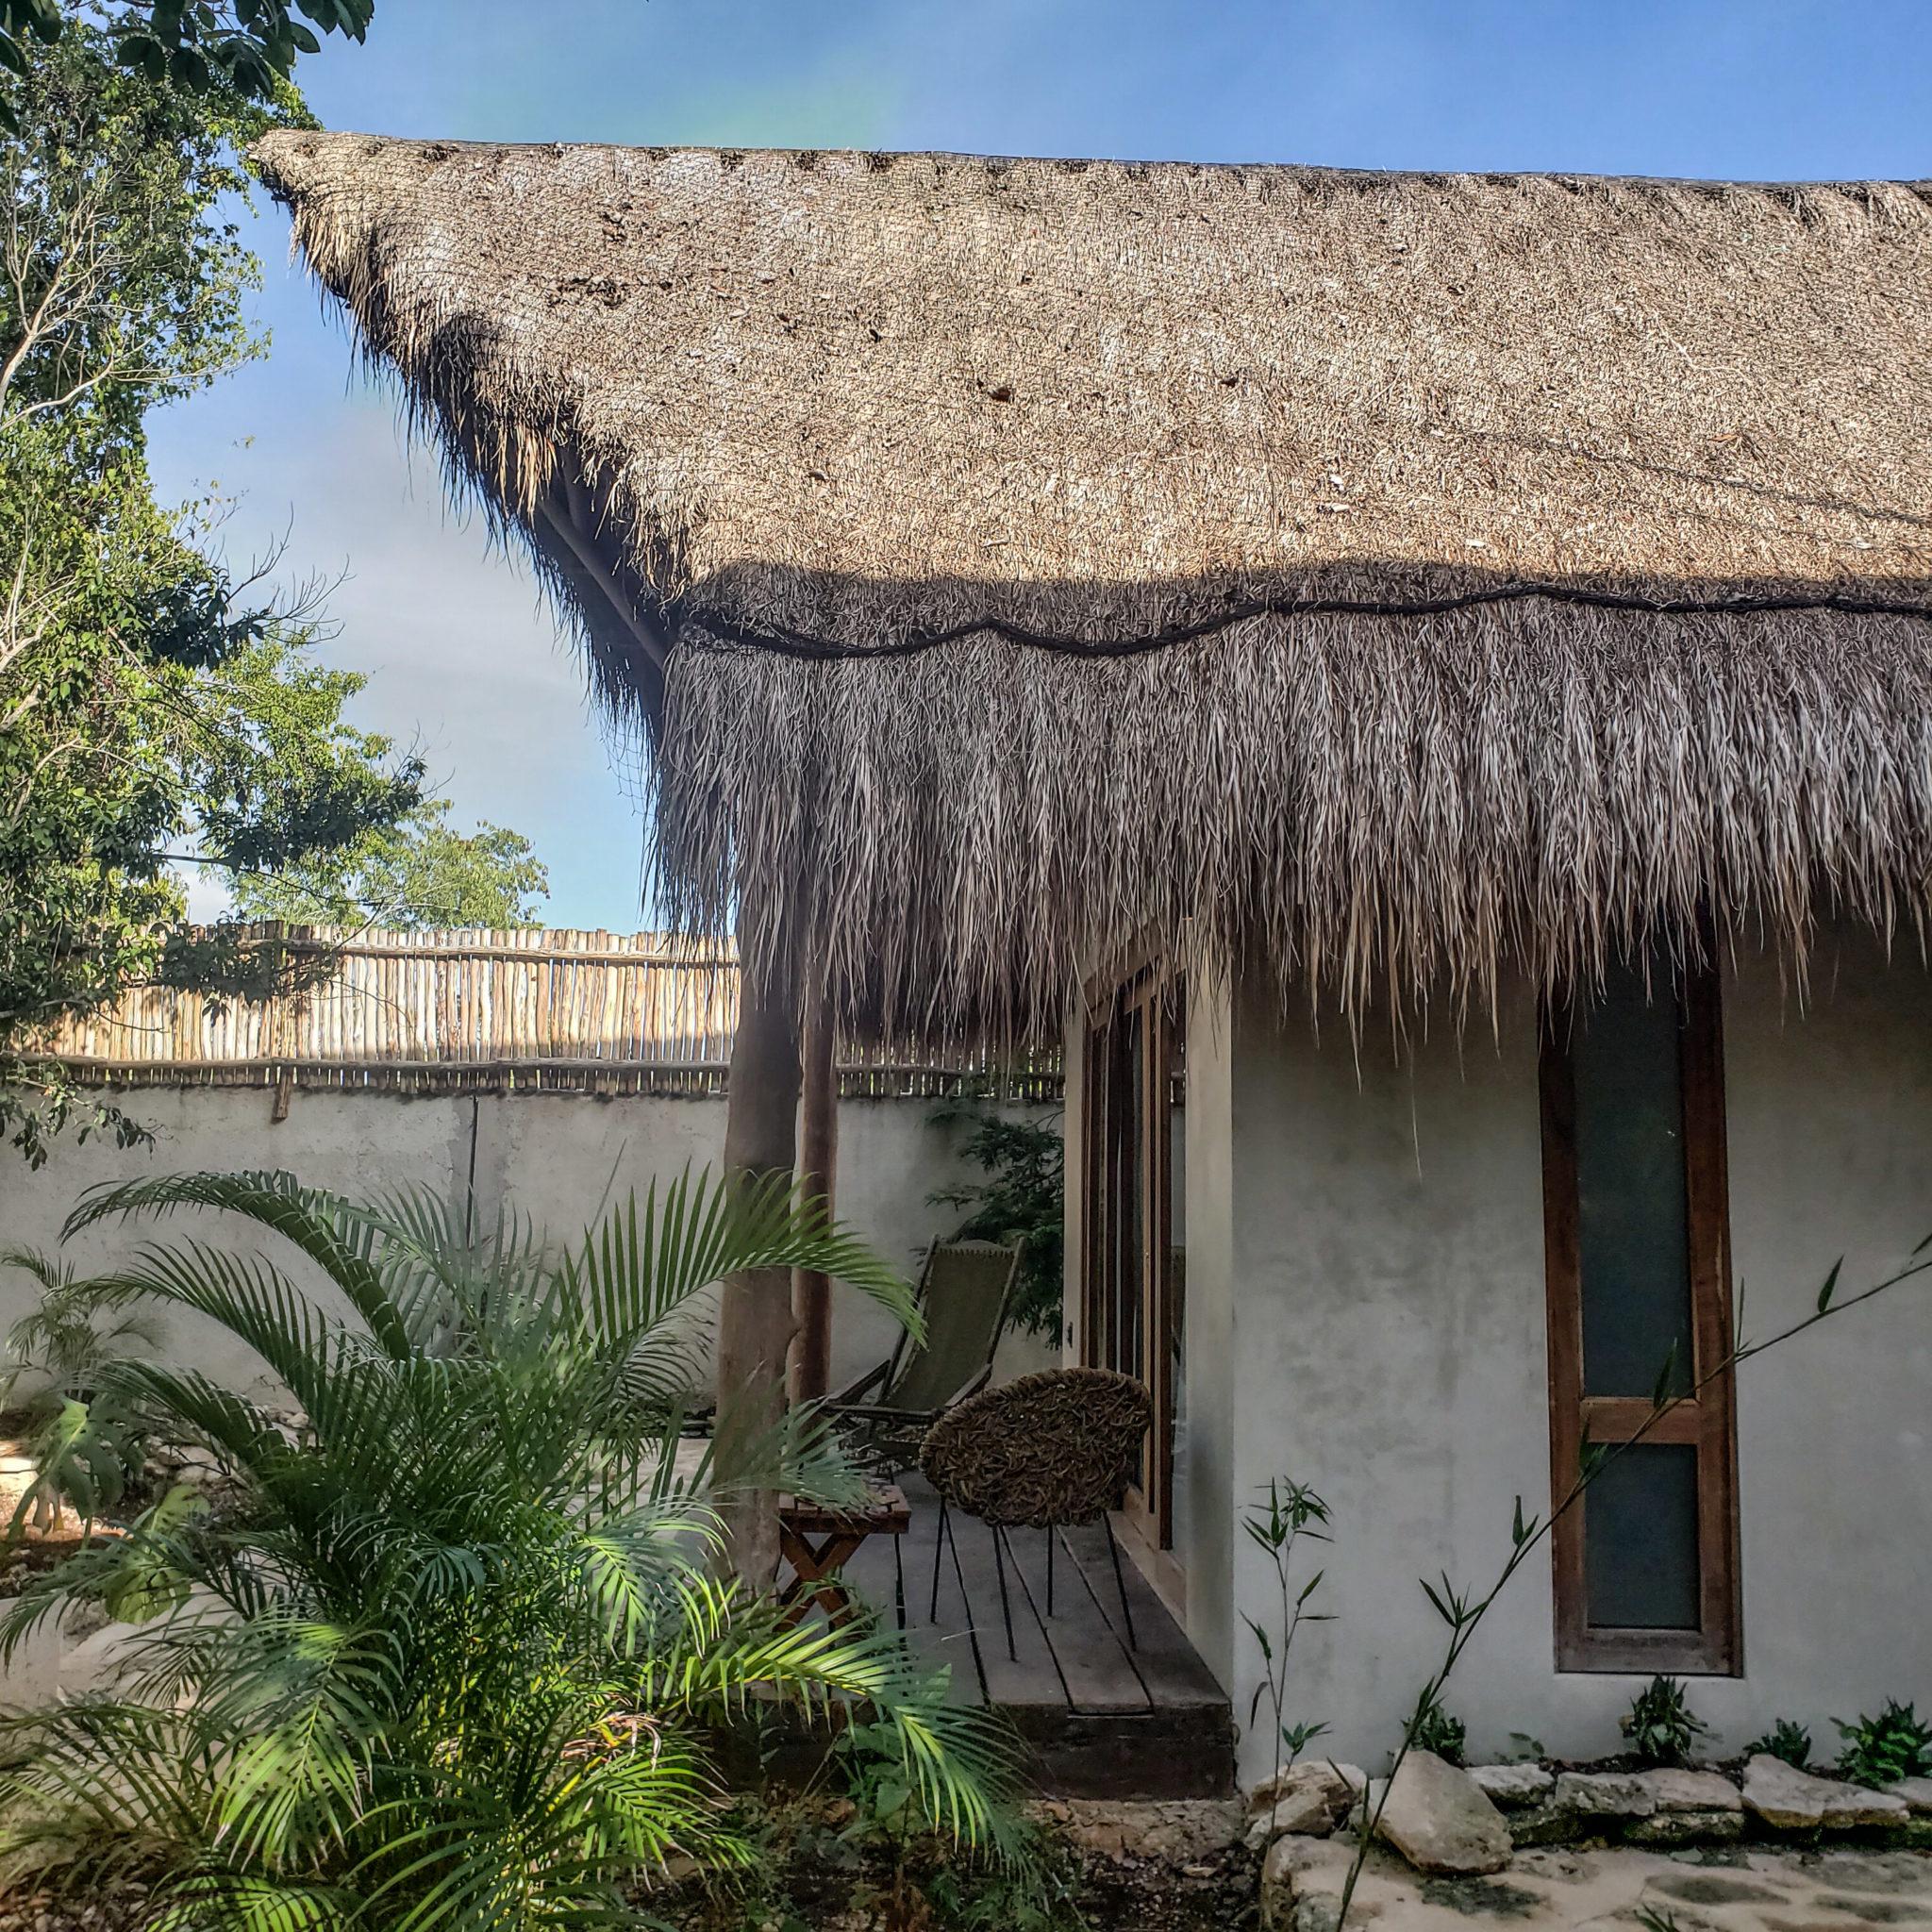 Acacia Jungle Bungalows Tulum